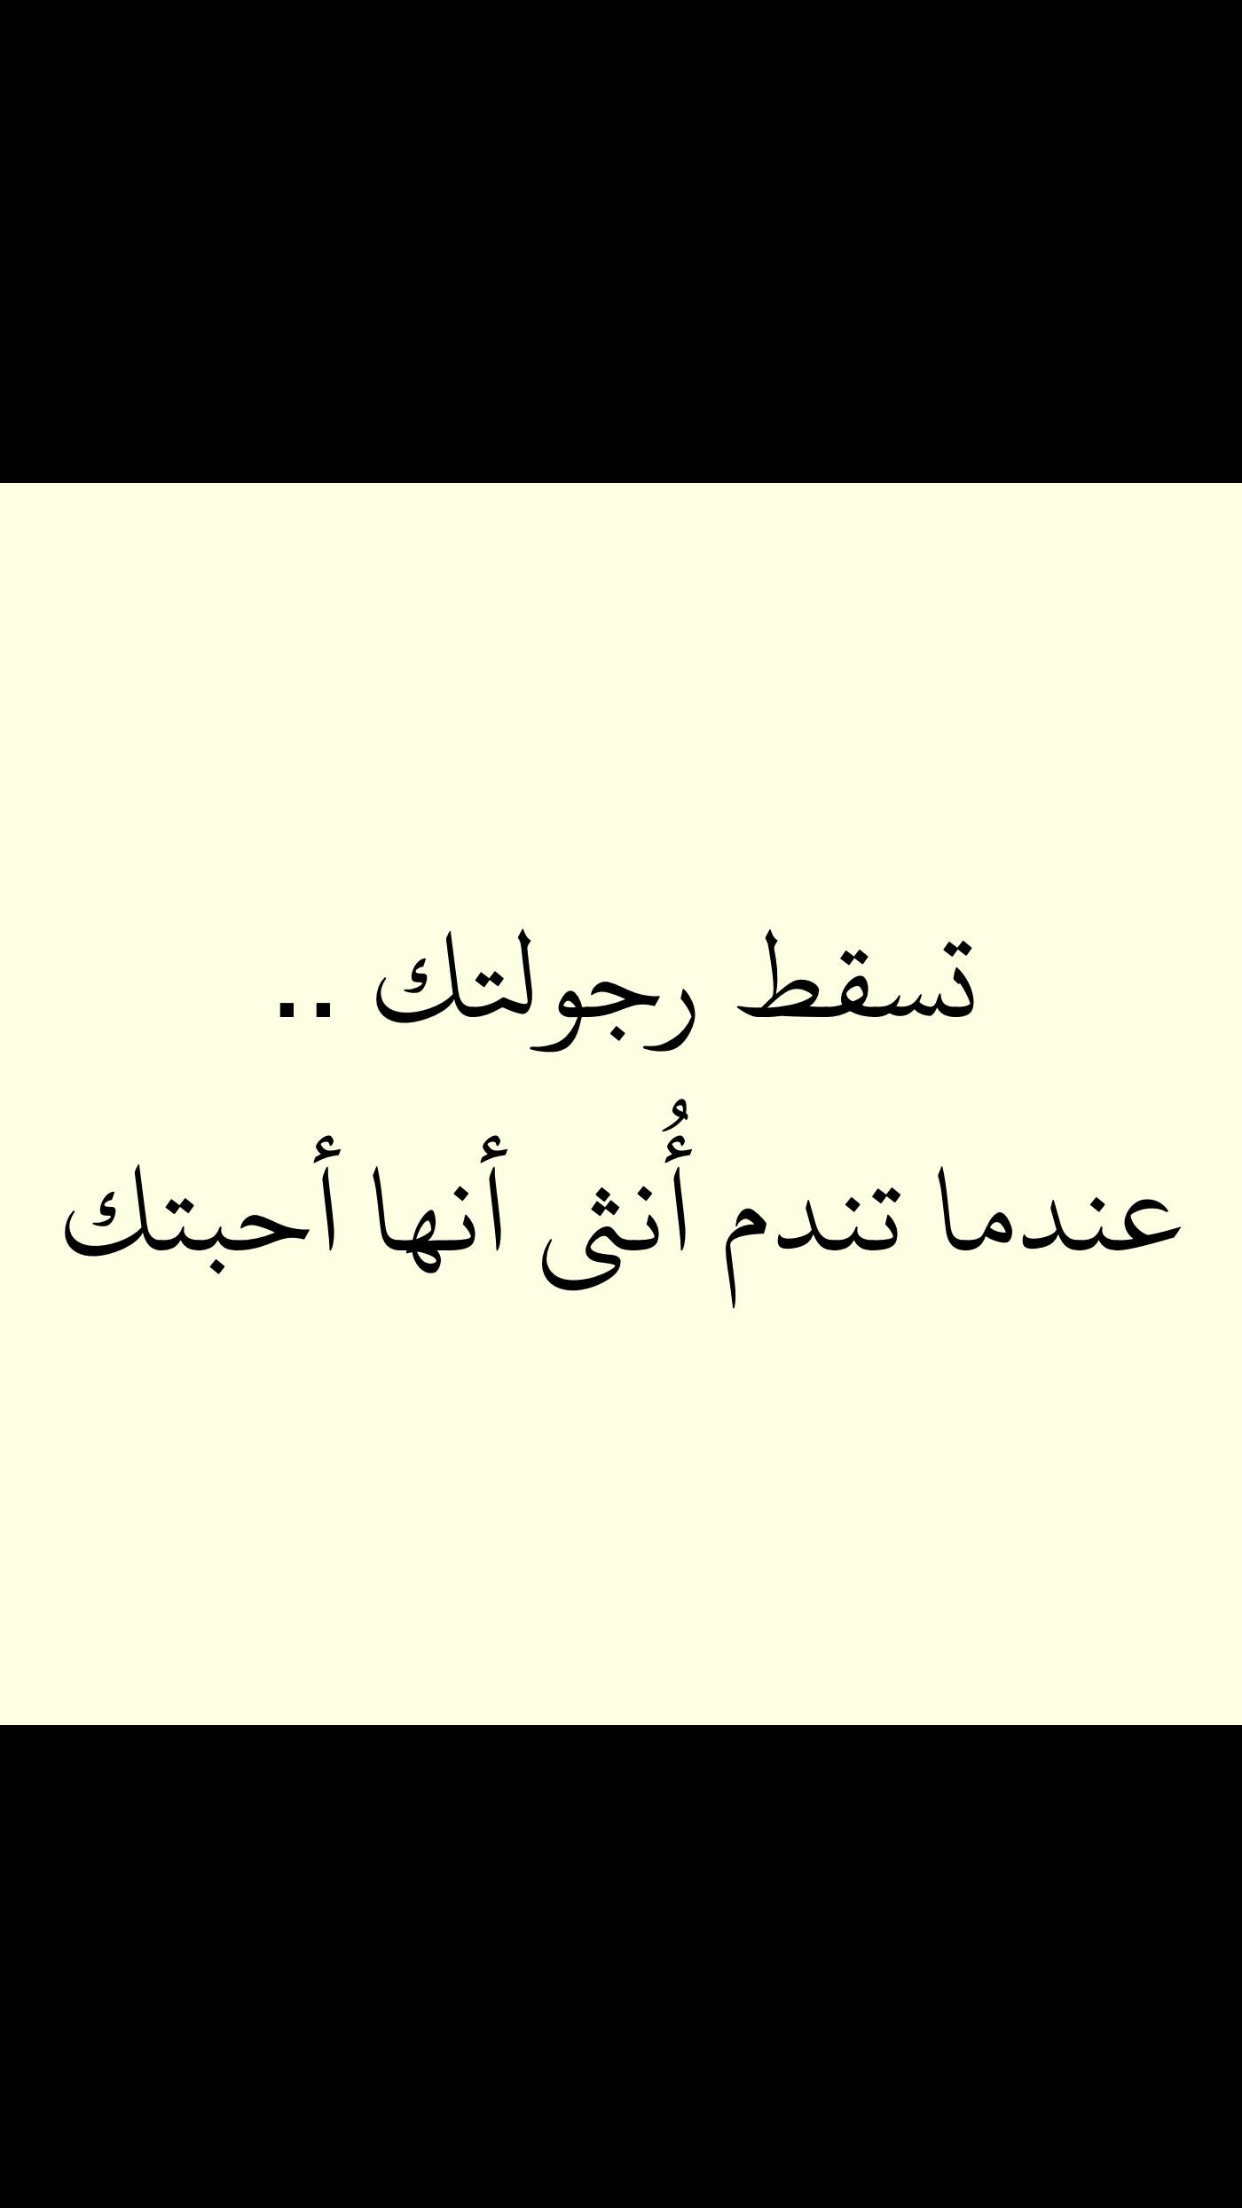 واي ندم ذلك اللذي اشعر به لانني يوما احسست بشئ ما نحوك Lines Quotes Beautiful Quotes Thoughts Quotes